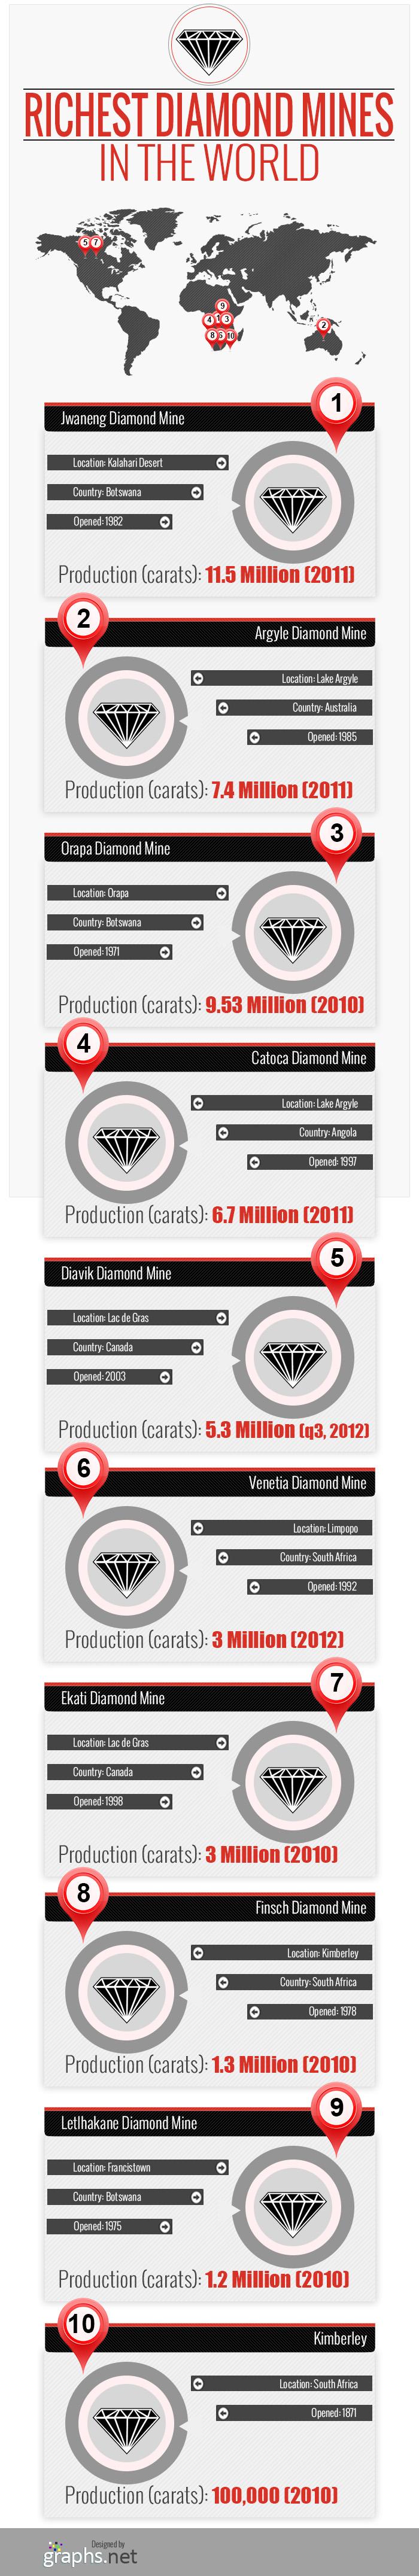 Richest-Diamond-Mines-in-the-World